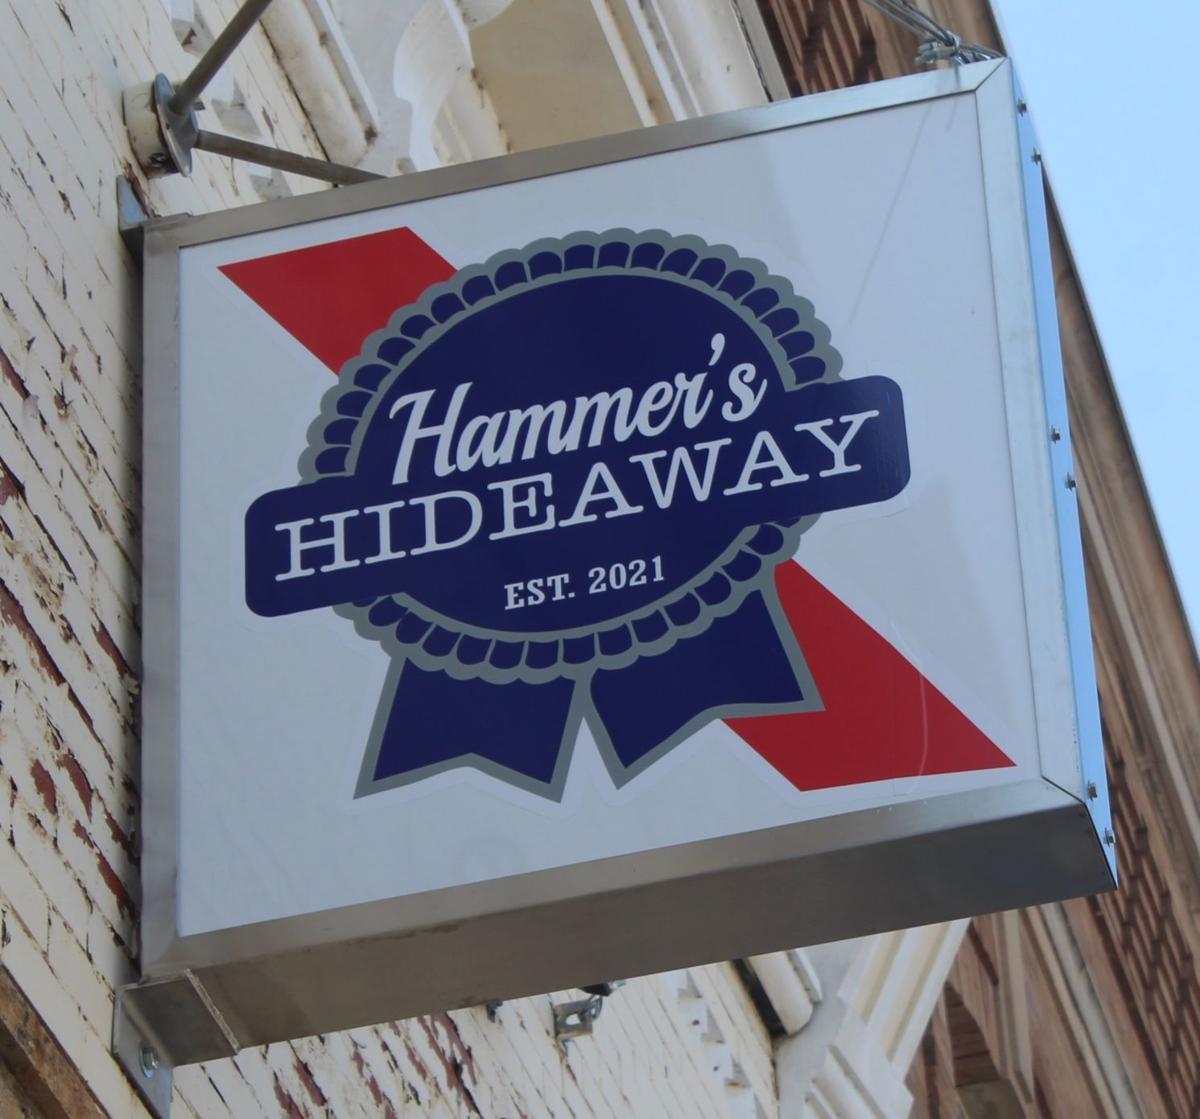 Hideaway 1